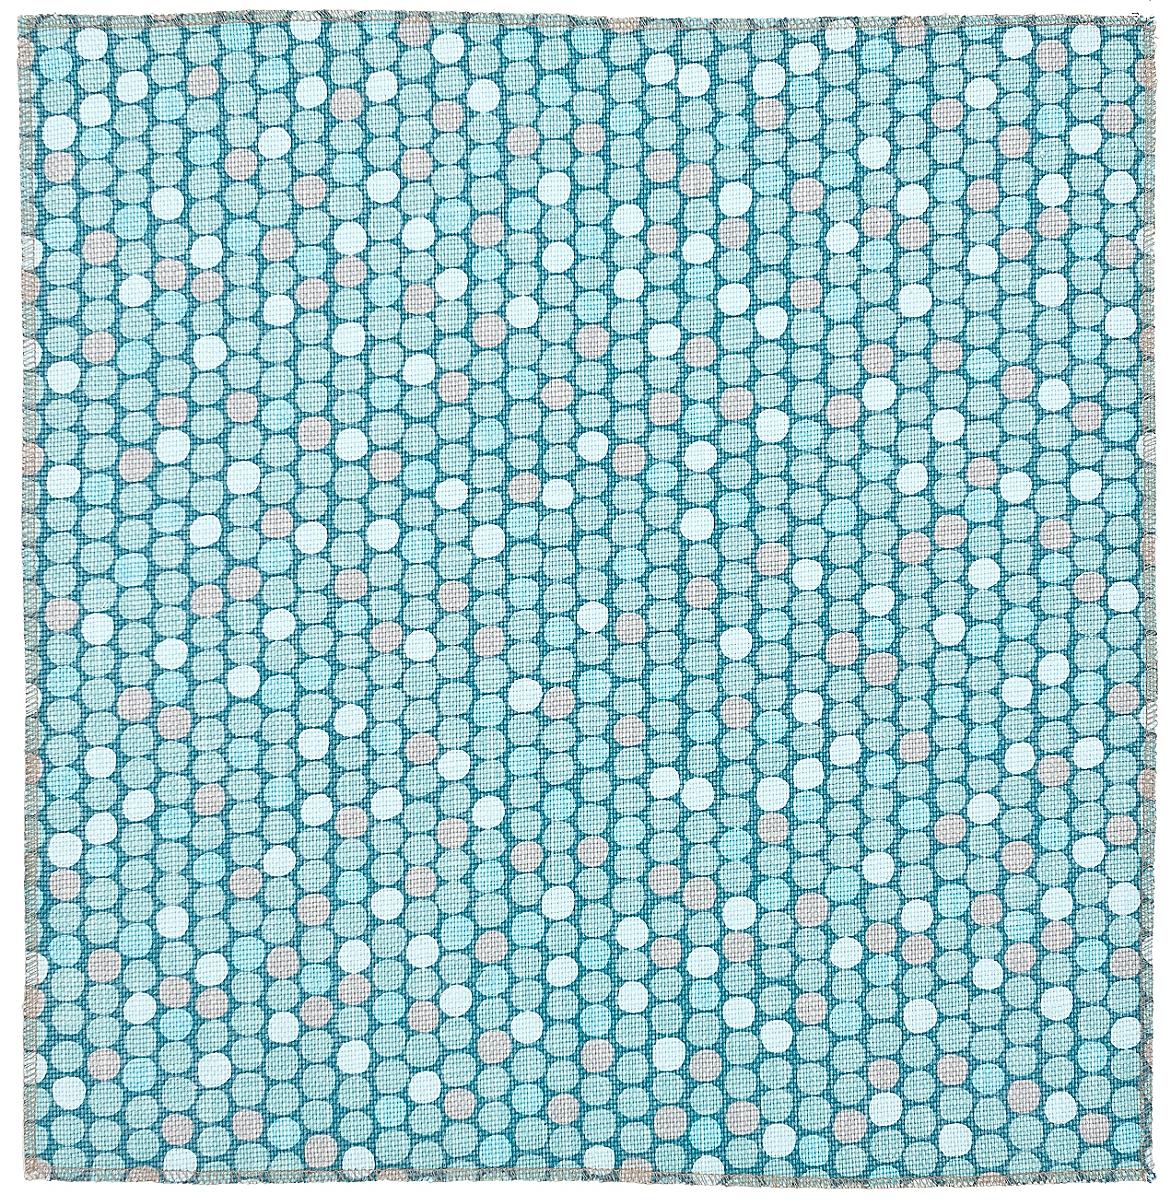 Lotsa Dots: Lagoon (fabric yardage)